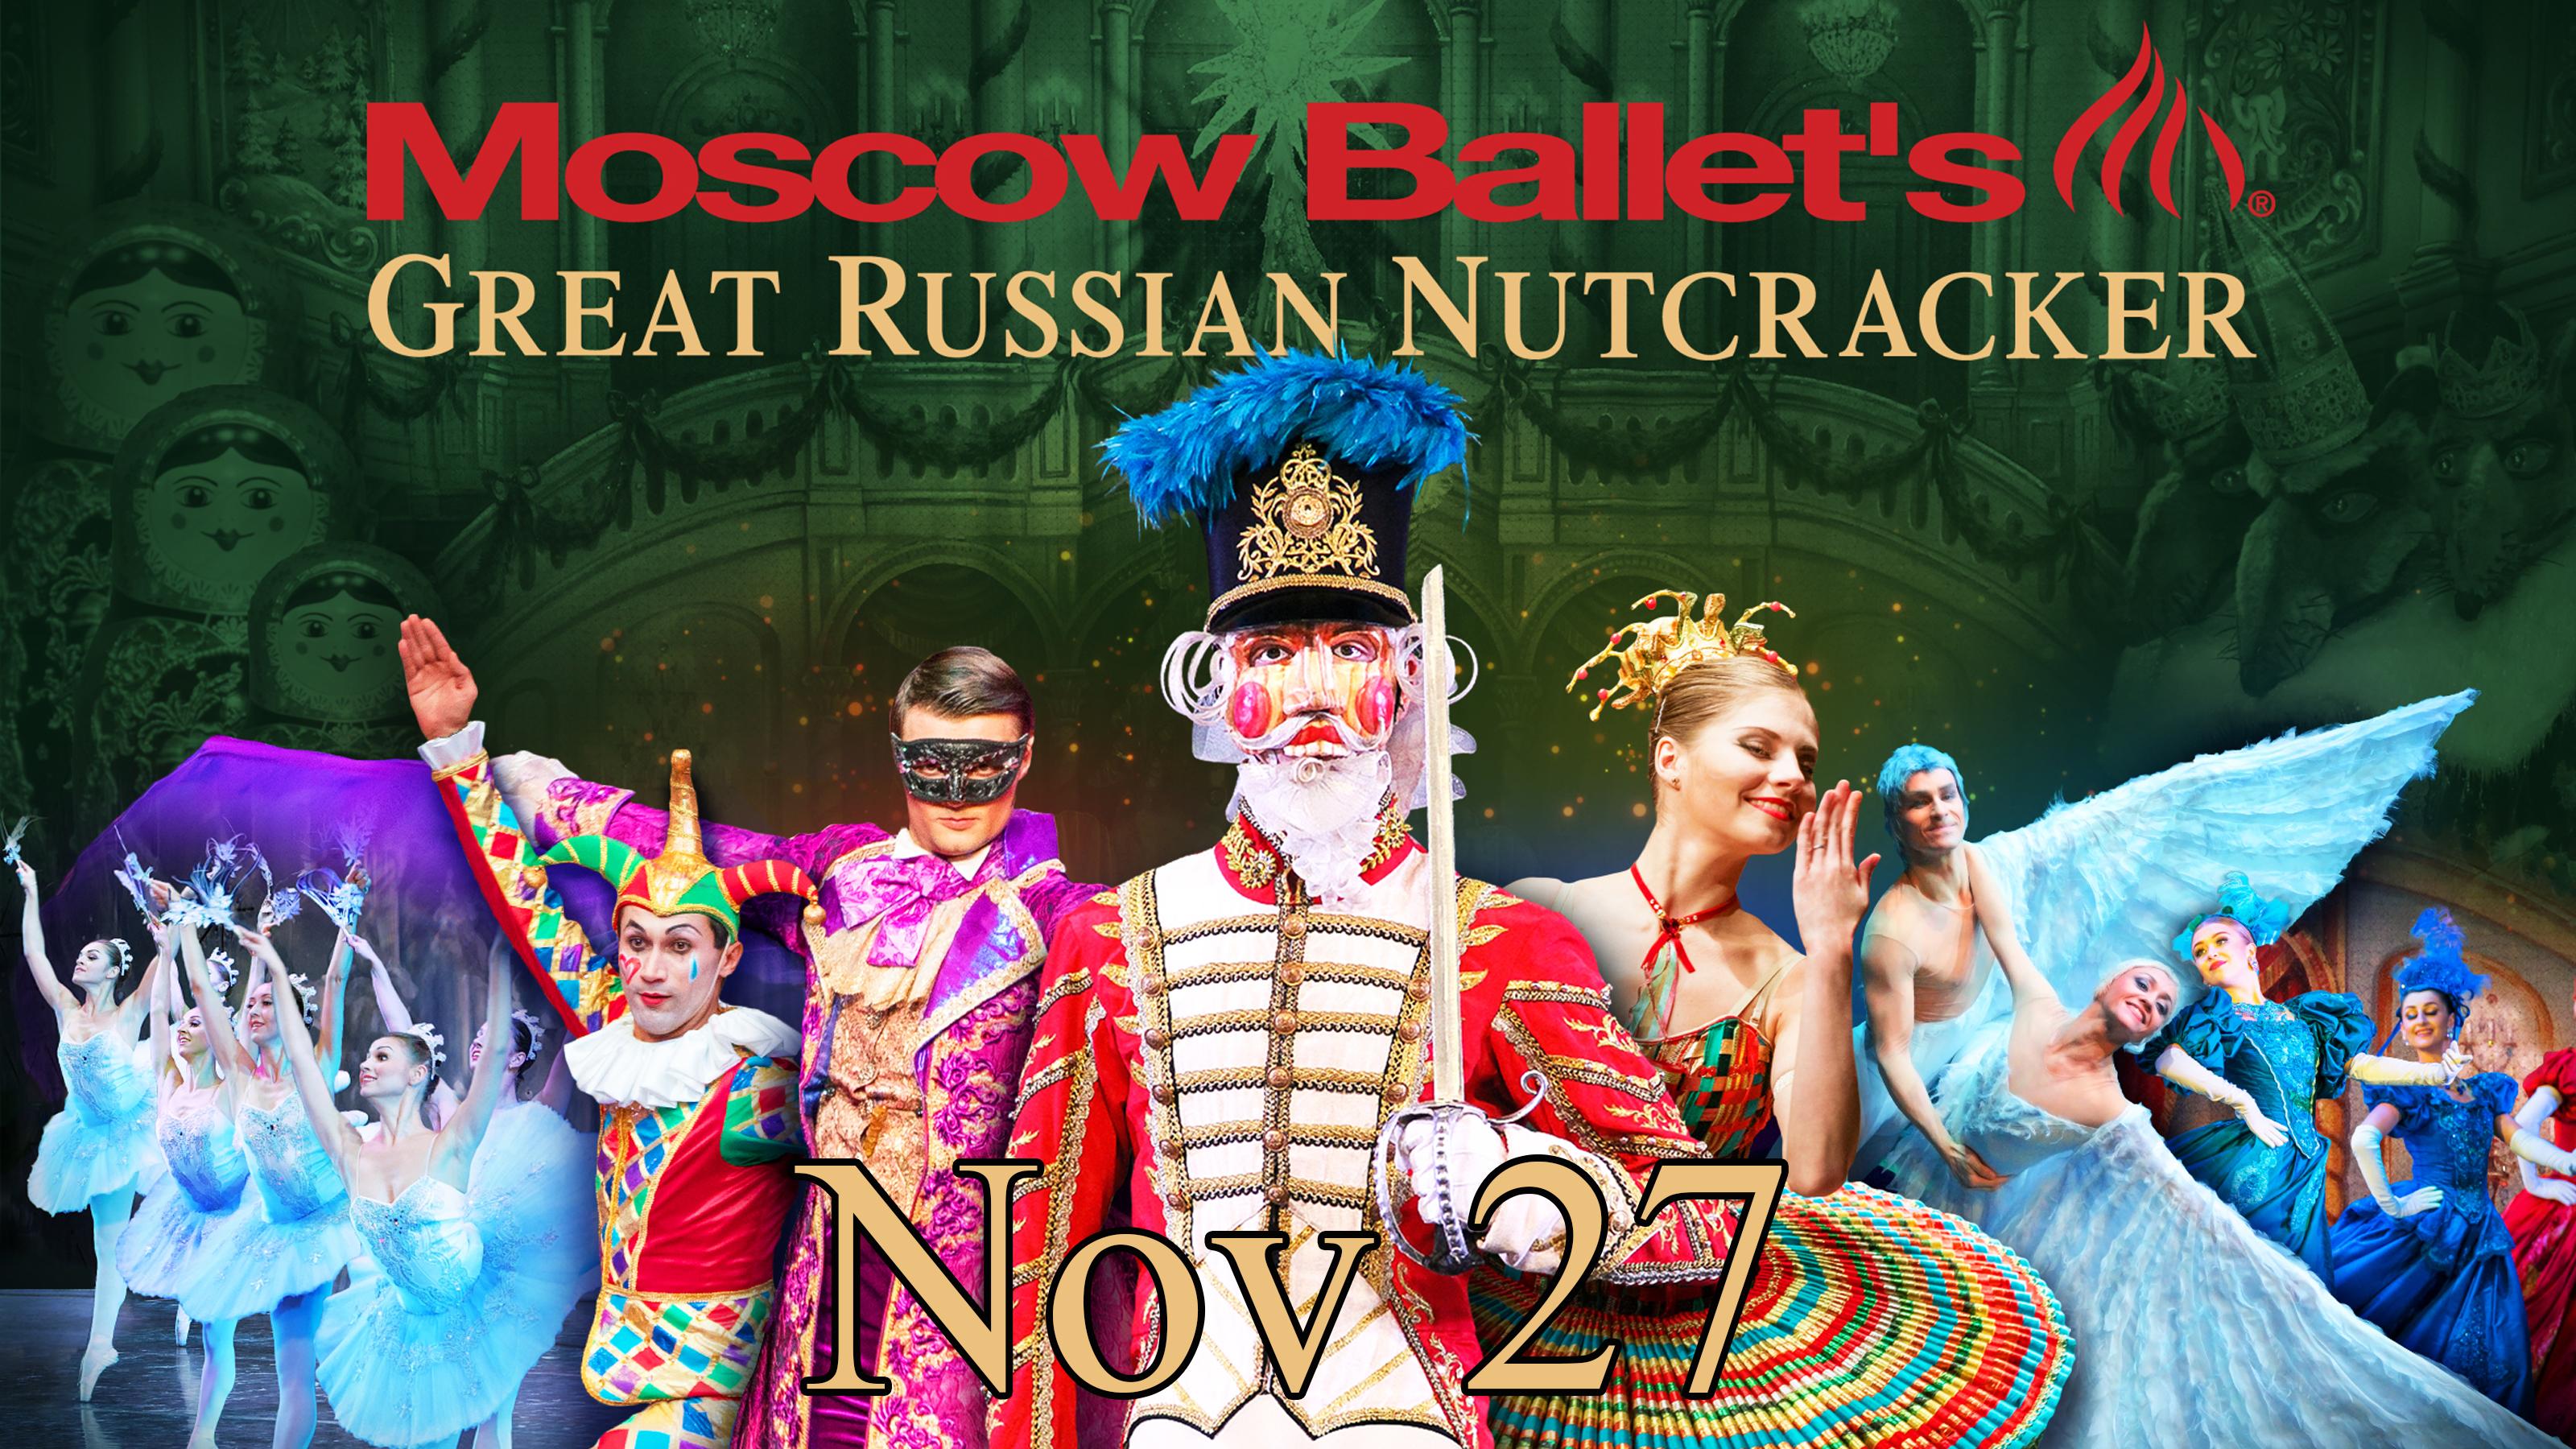 Moscow Ballet - Great Russian Nutcracker - Nov 27